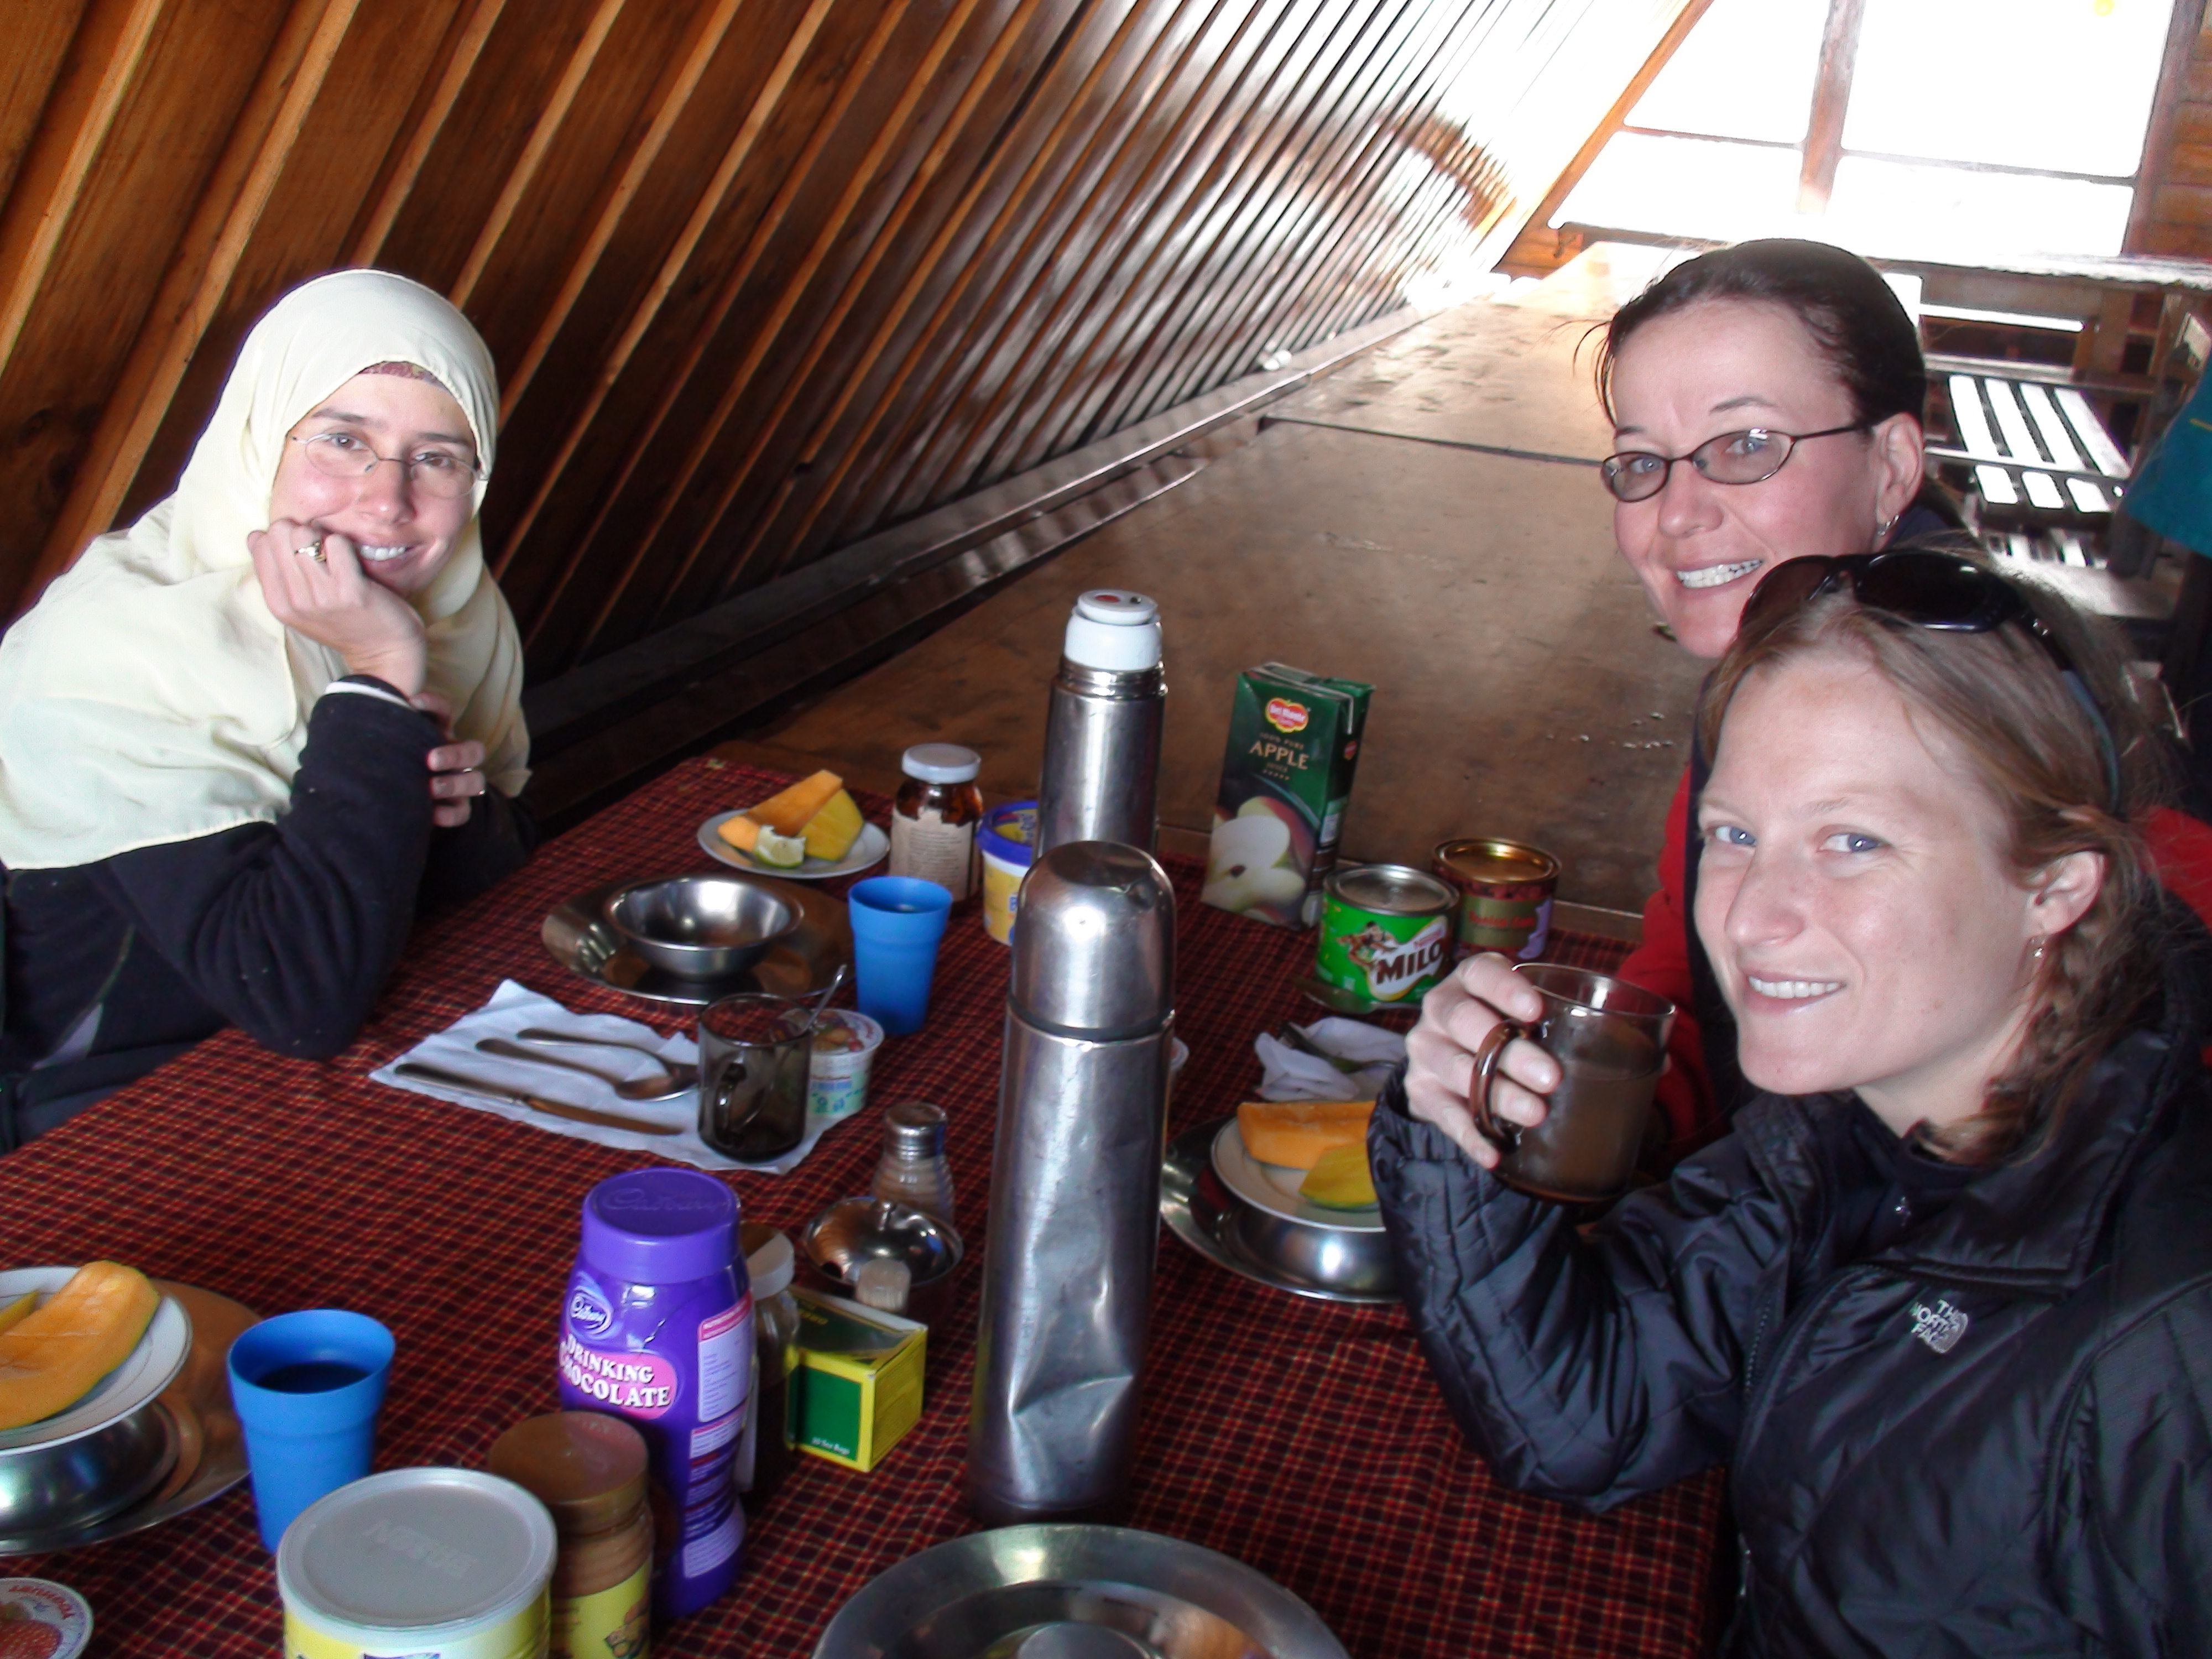 Breakfast at Horombo's!